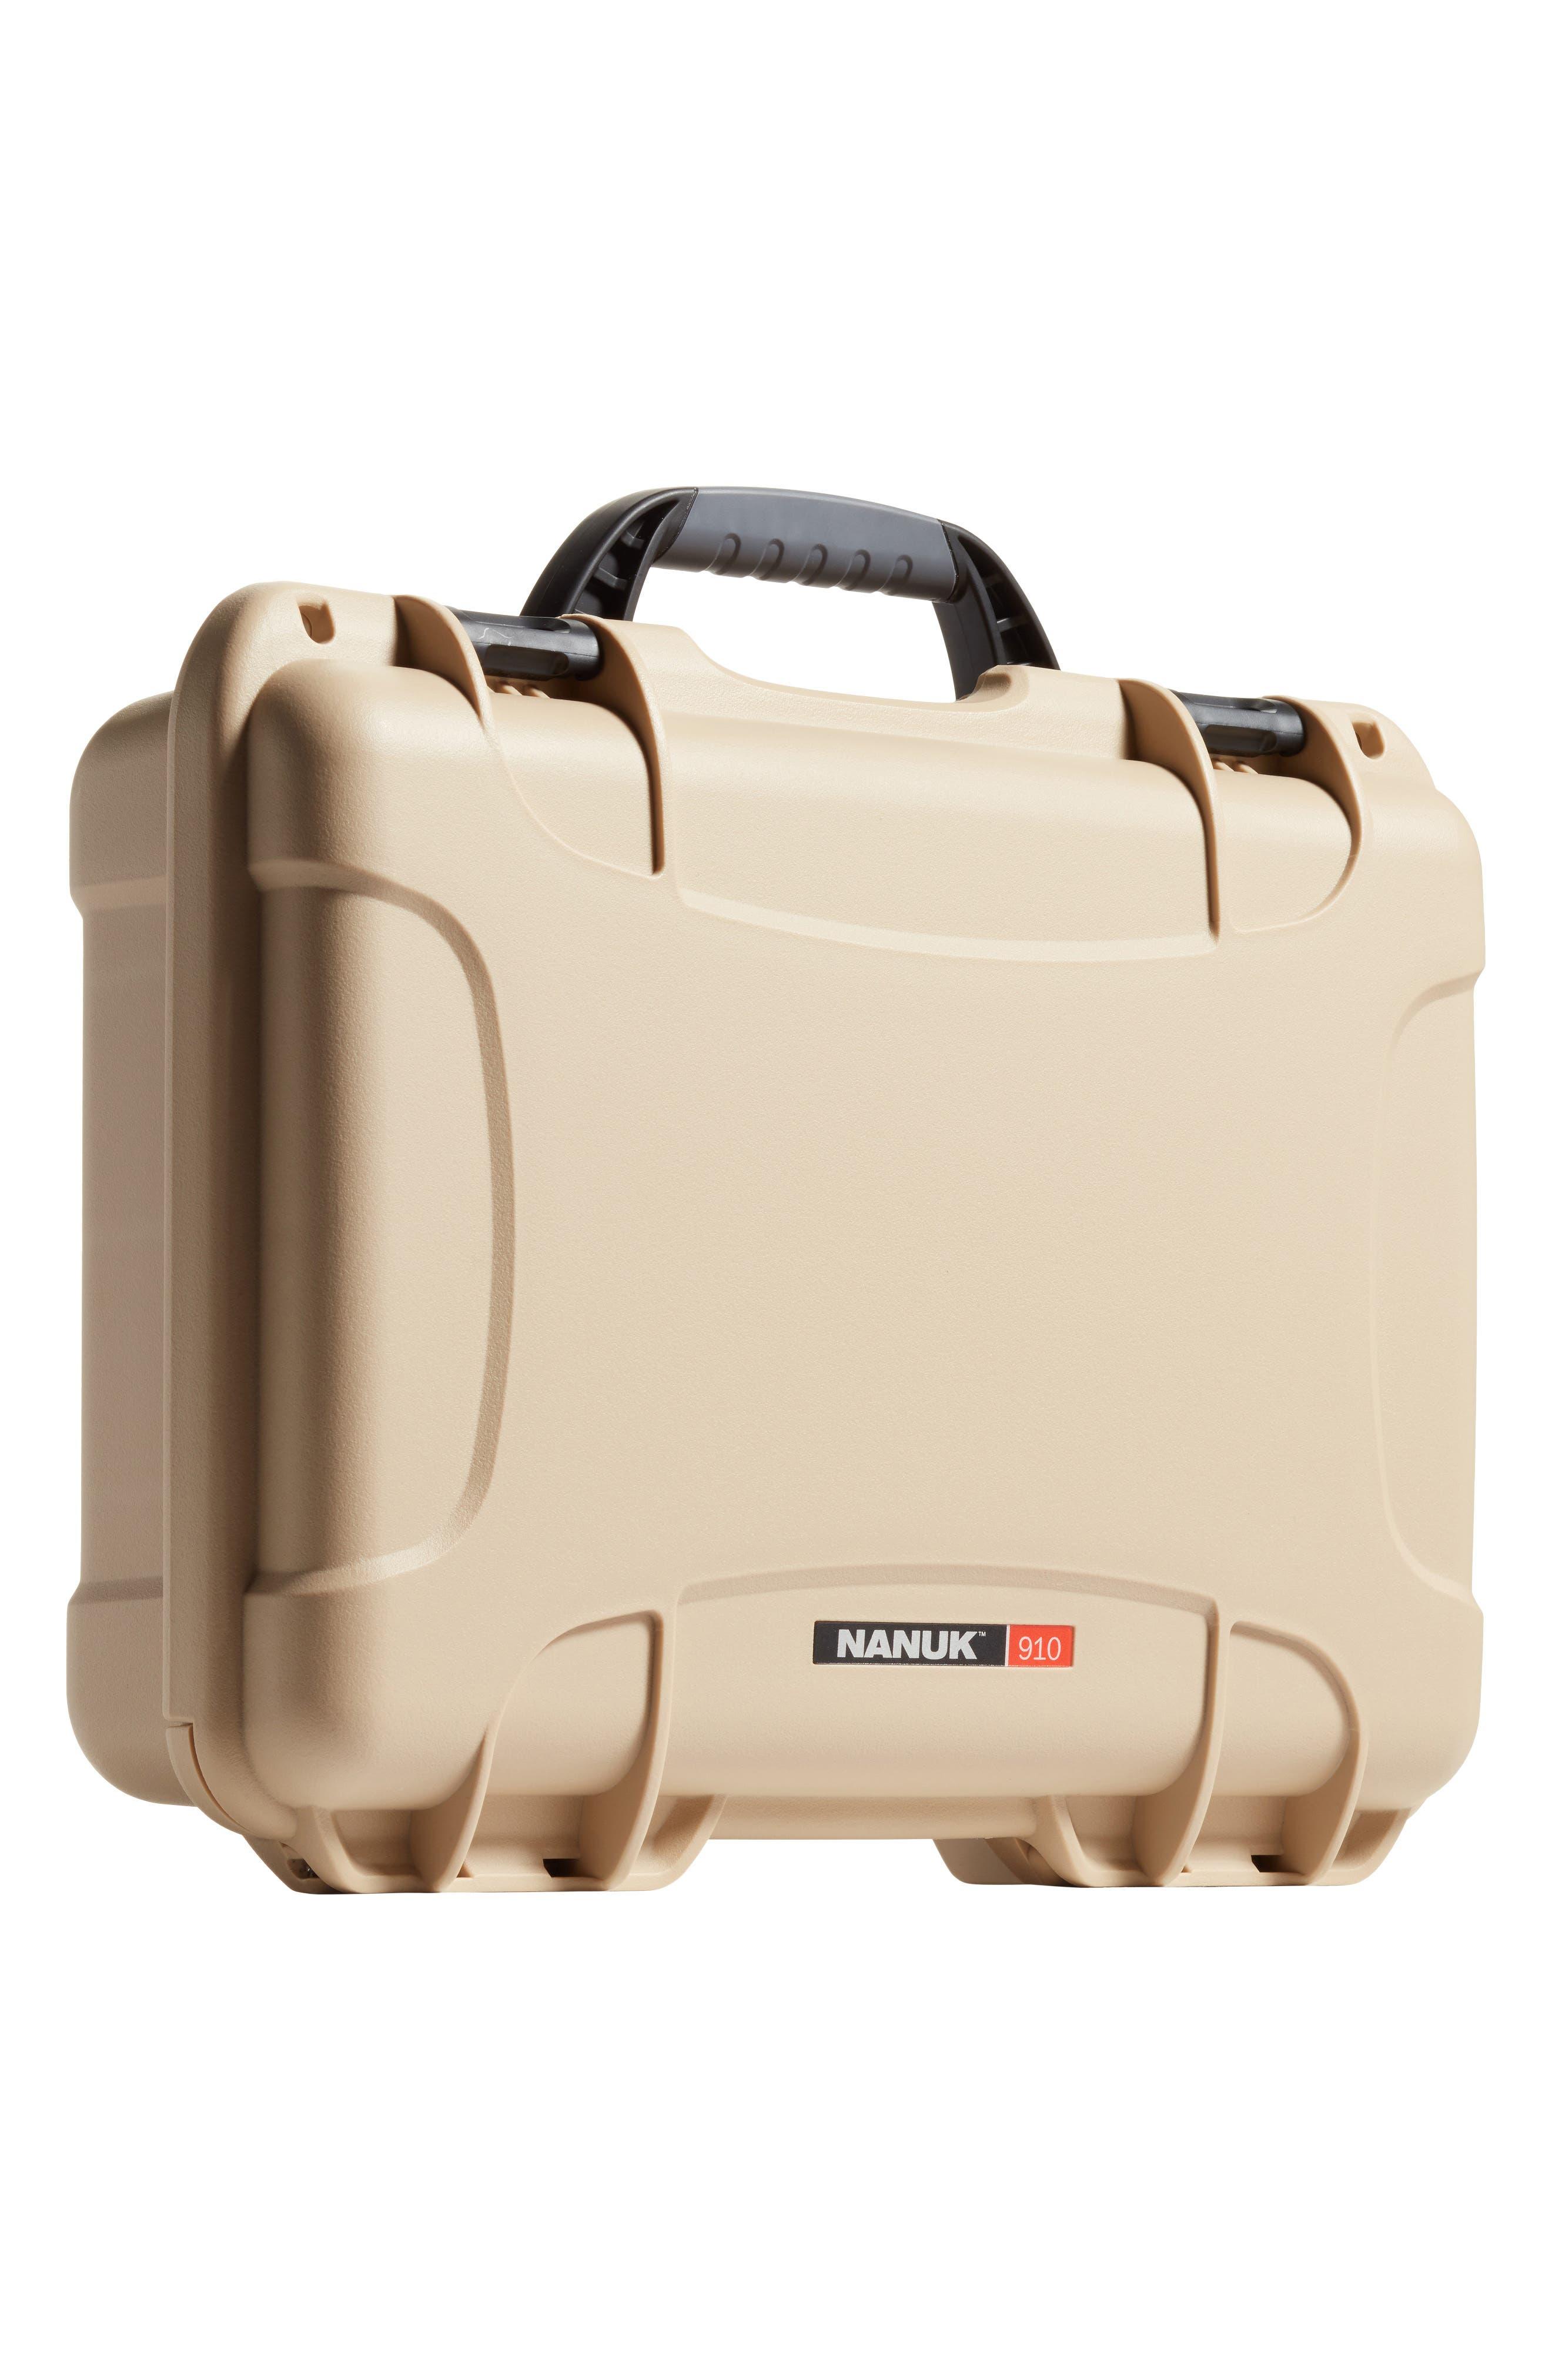 Nanuk 910 Waterproof Hard Case